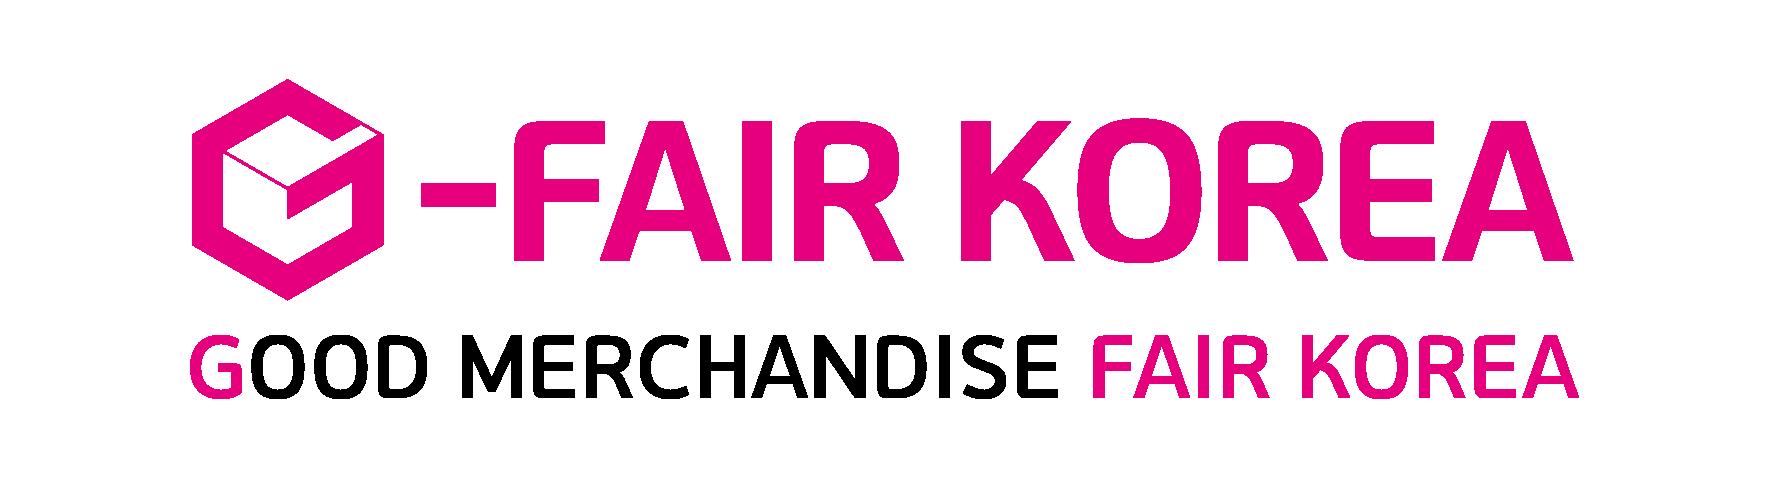 G-Fair Korea